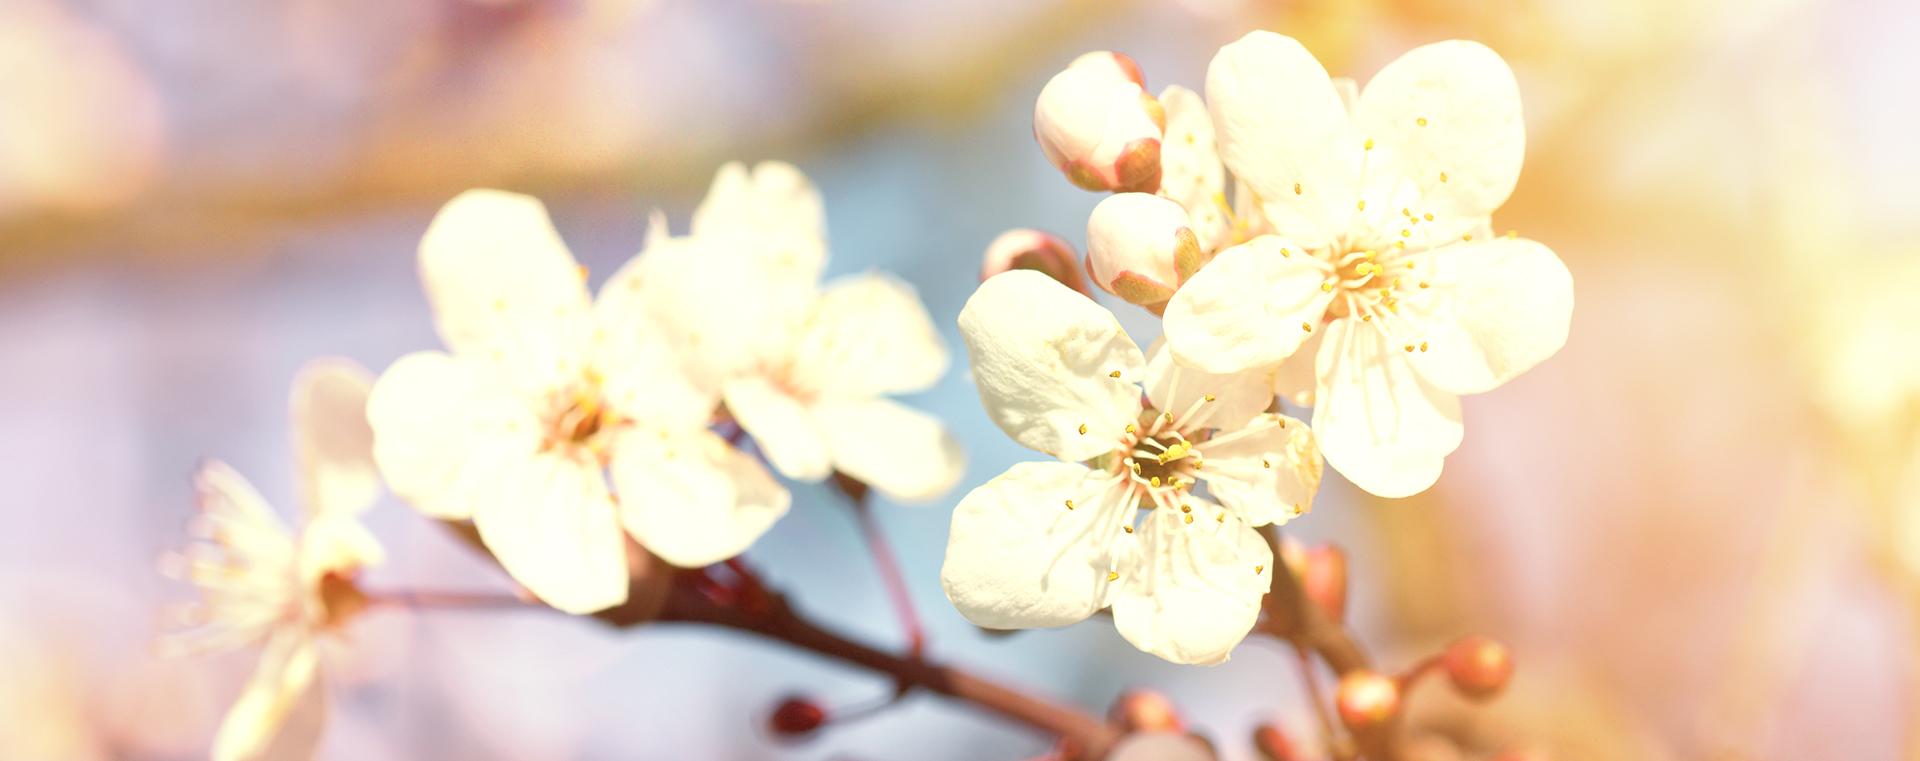 Cherry Plum Kirschpflaume Angst und Sorge Lemon Pharma Original Bachblüten